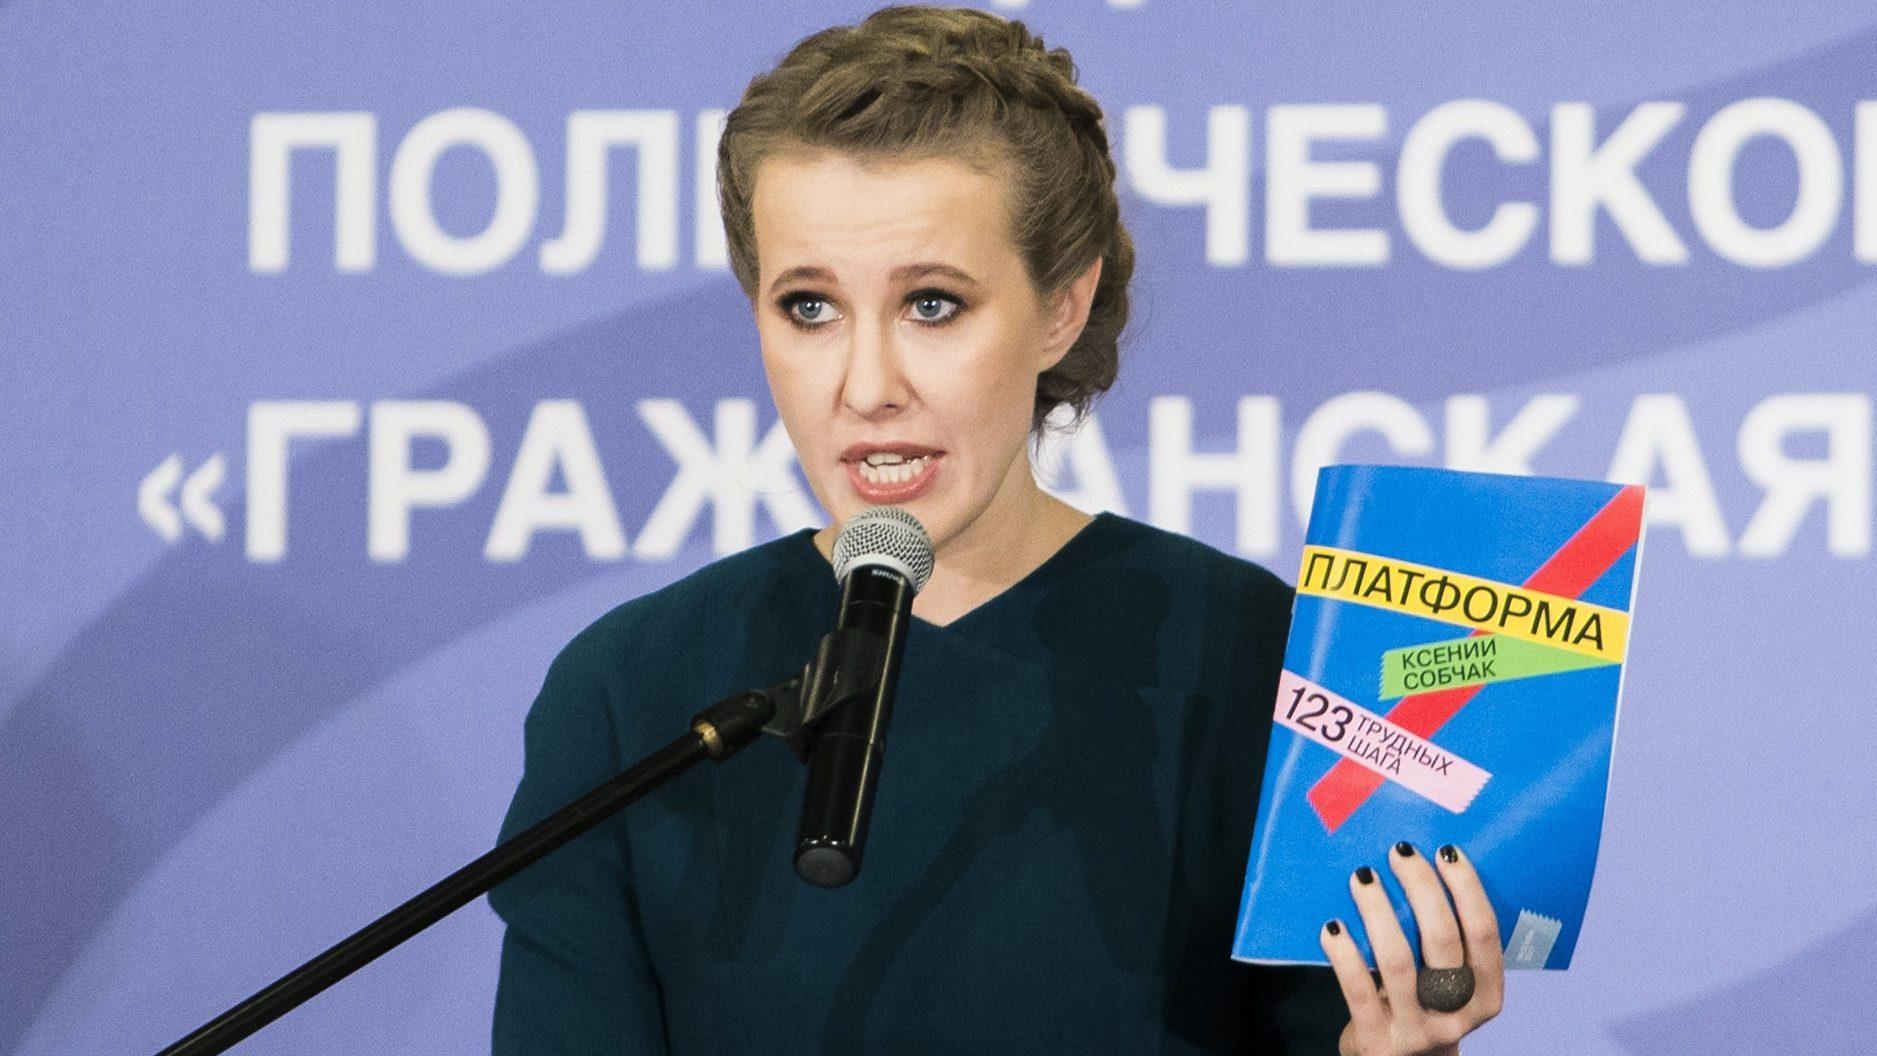 Sobchak unveils her 123-step policy program.